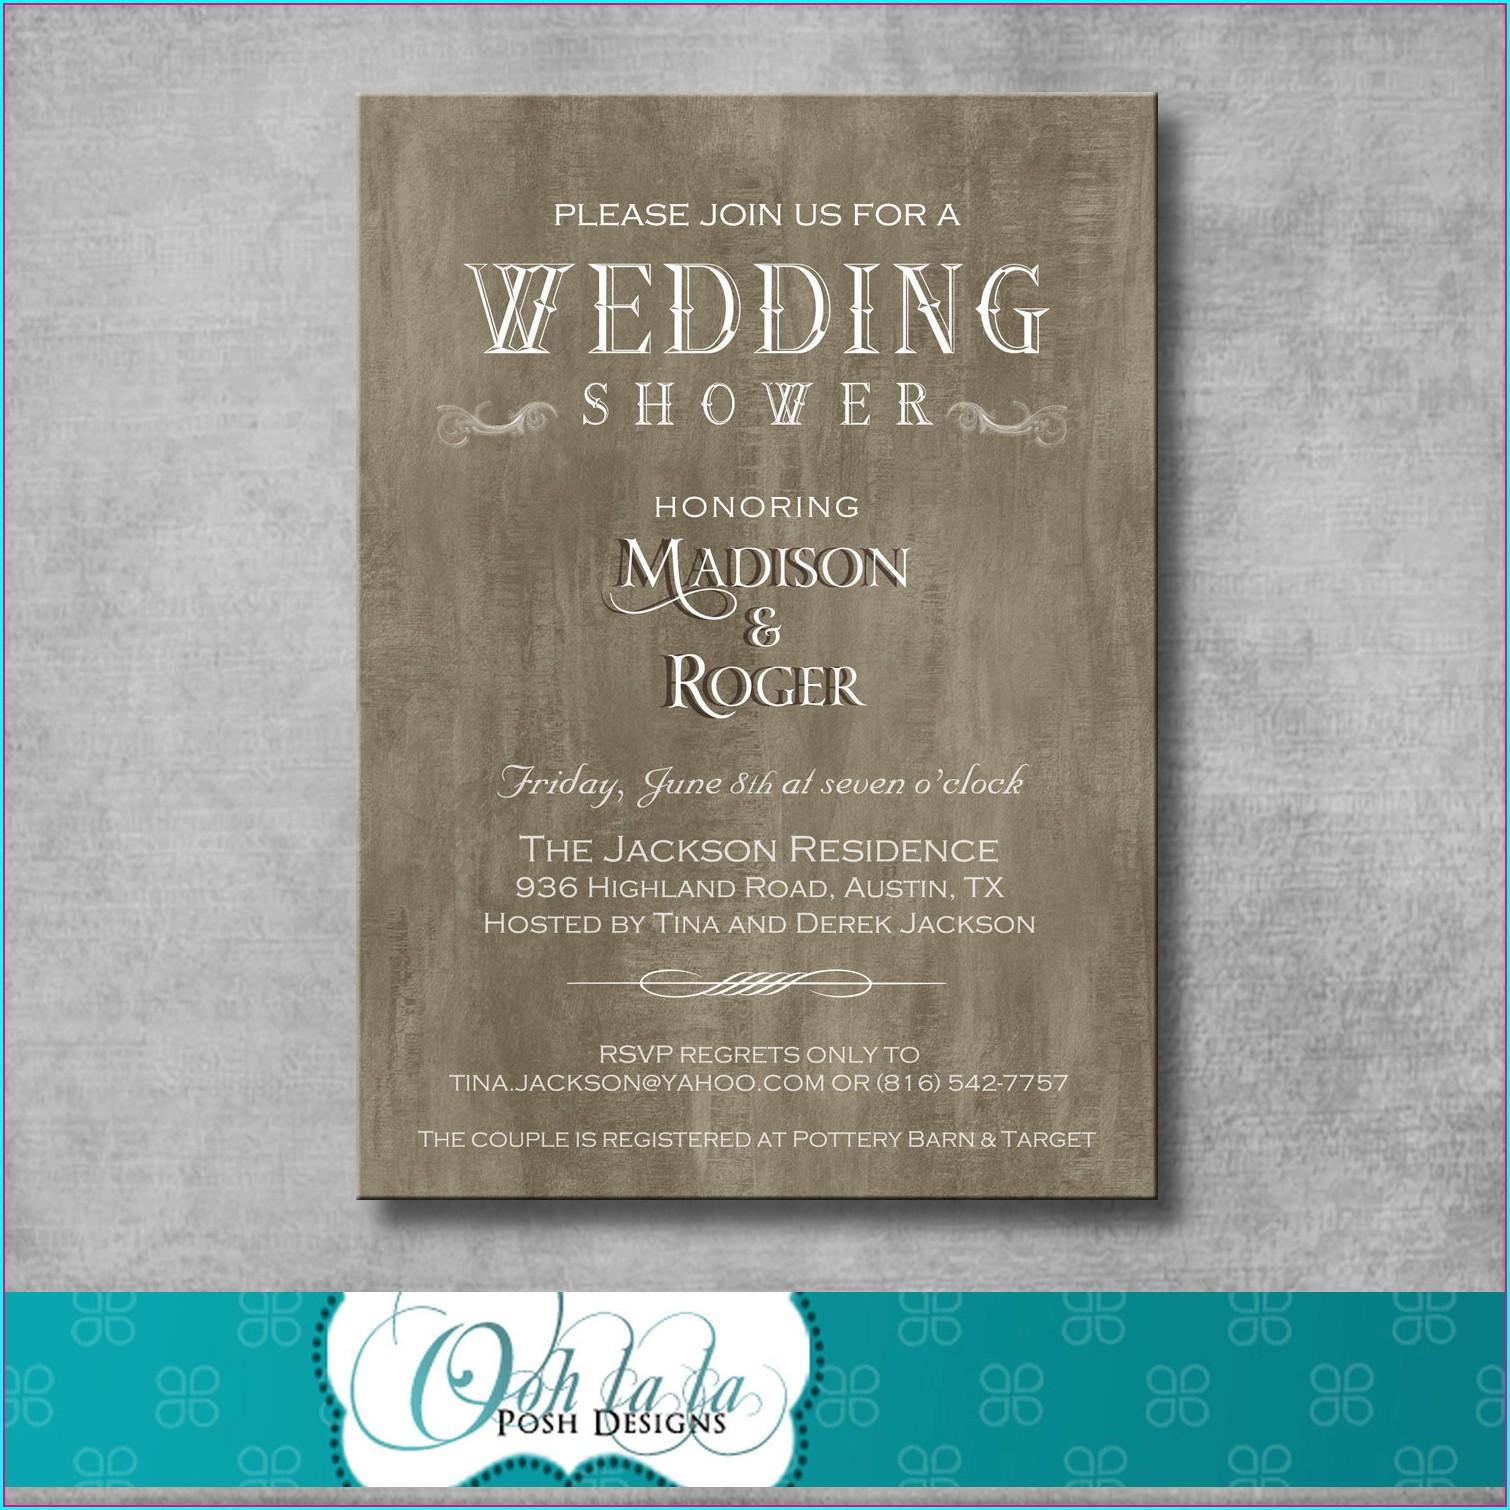 Staples Wedding Invitations Reviews